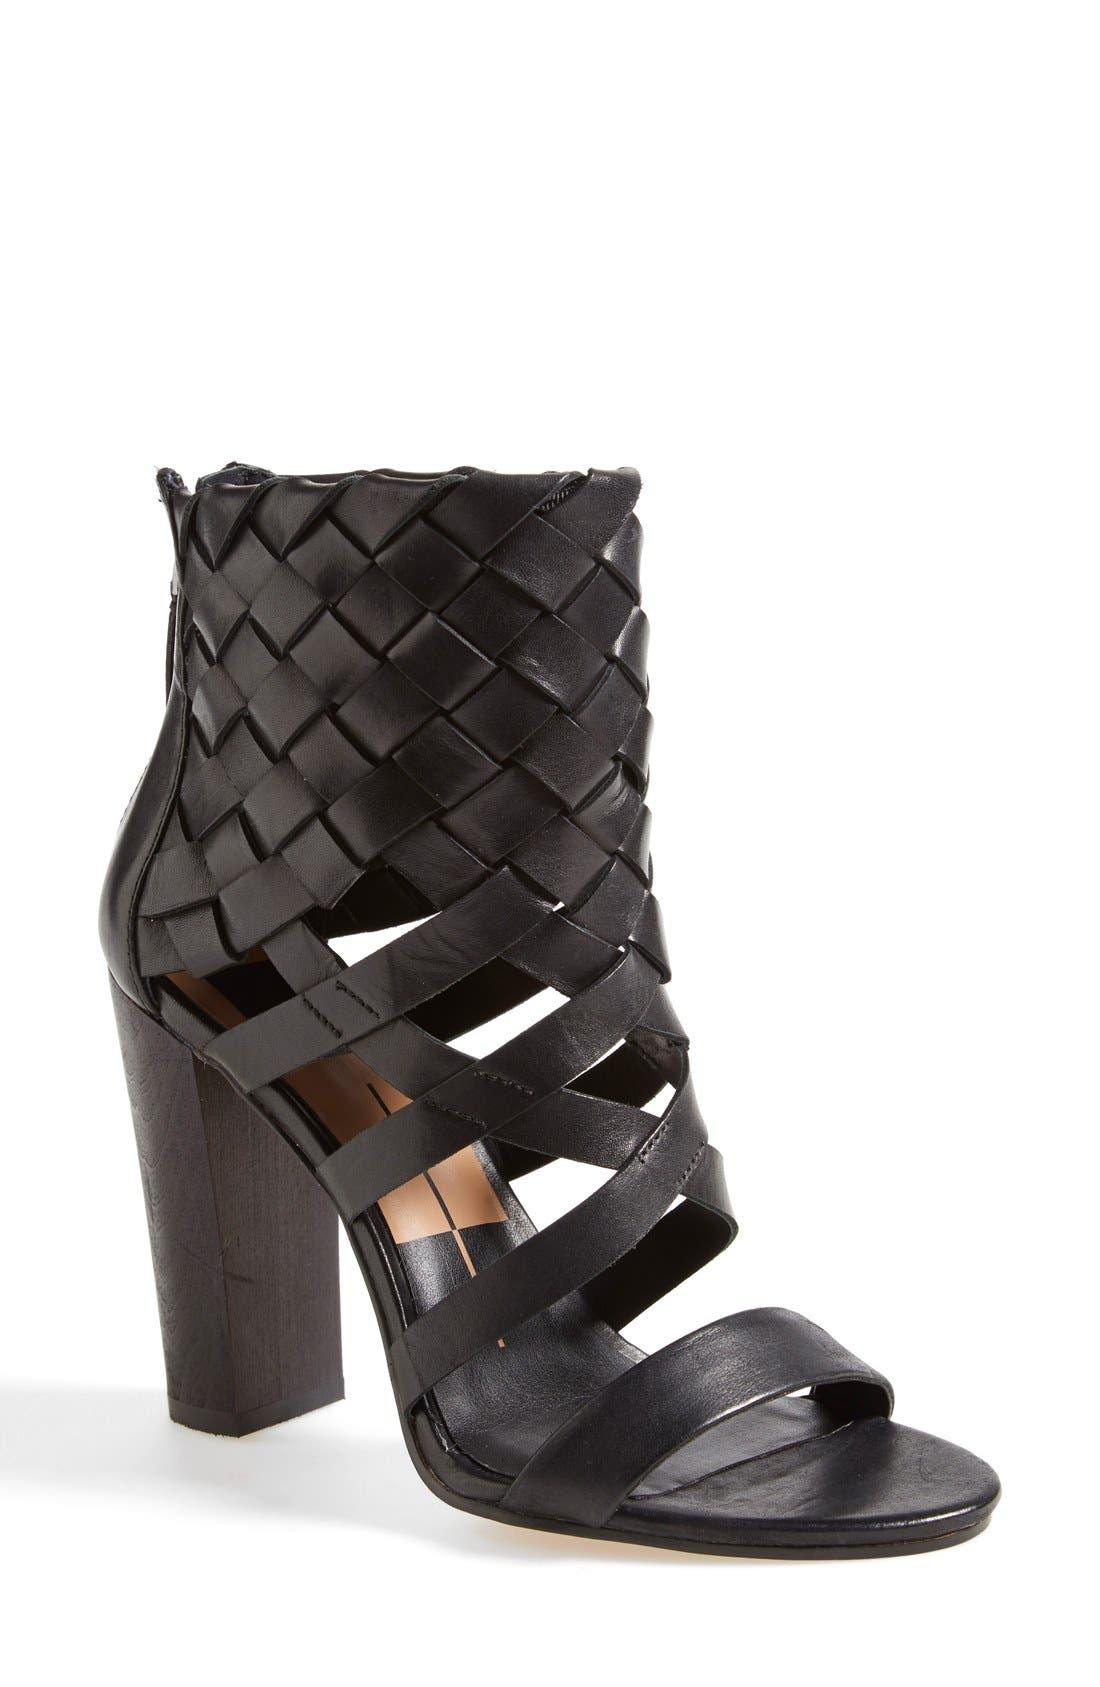 Main Image - Dolce Vita 'Nakita' Woven Leather Sandal